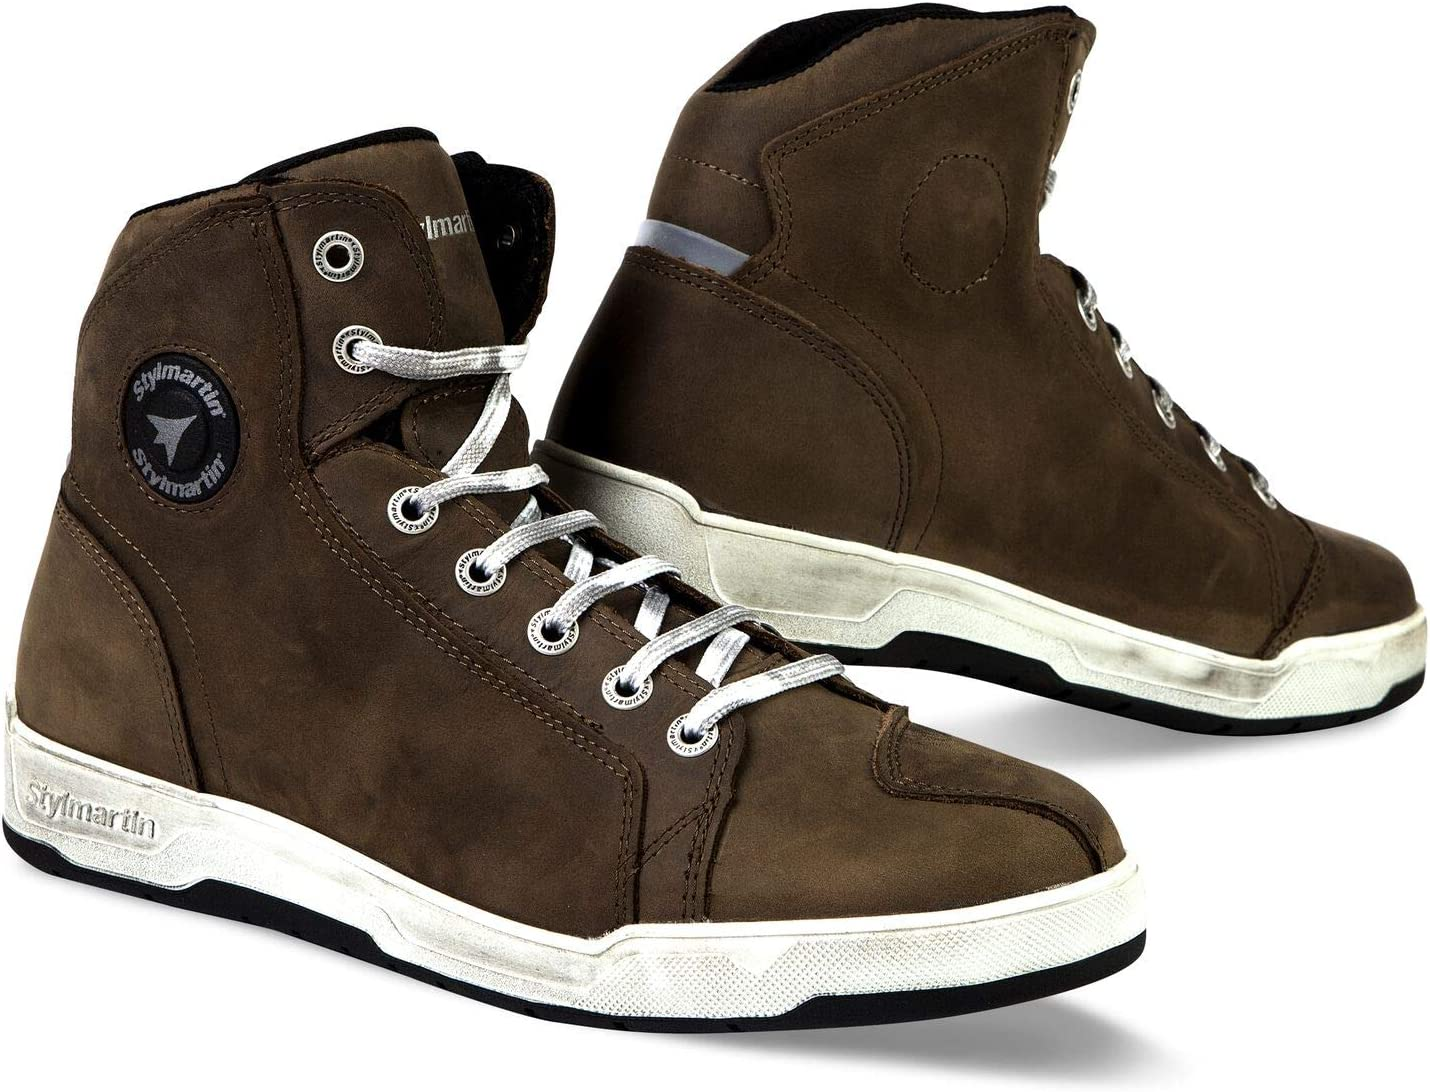 Stylmartin Adult Marshall Urban Line Sneakers Brown, Size: US-7.5, EU-40